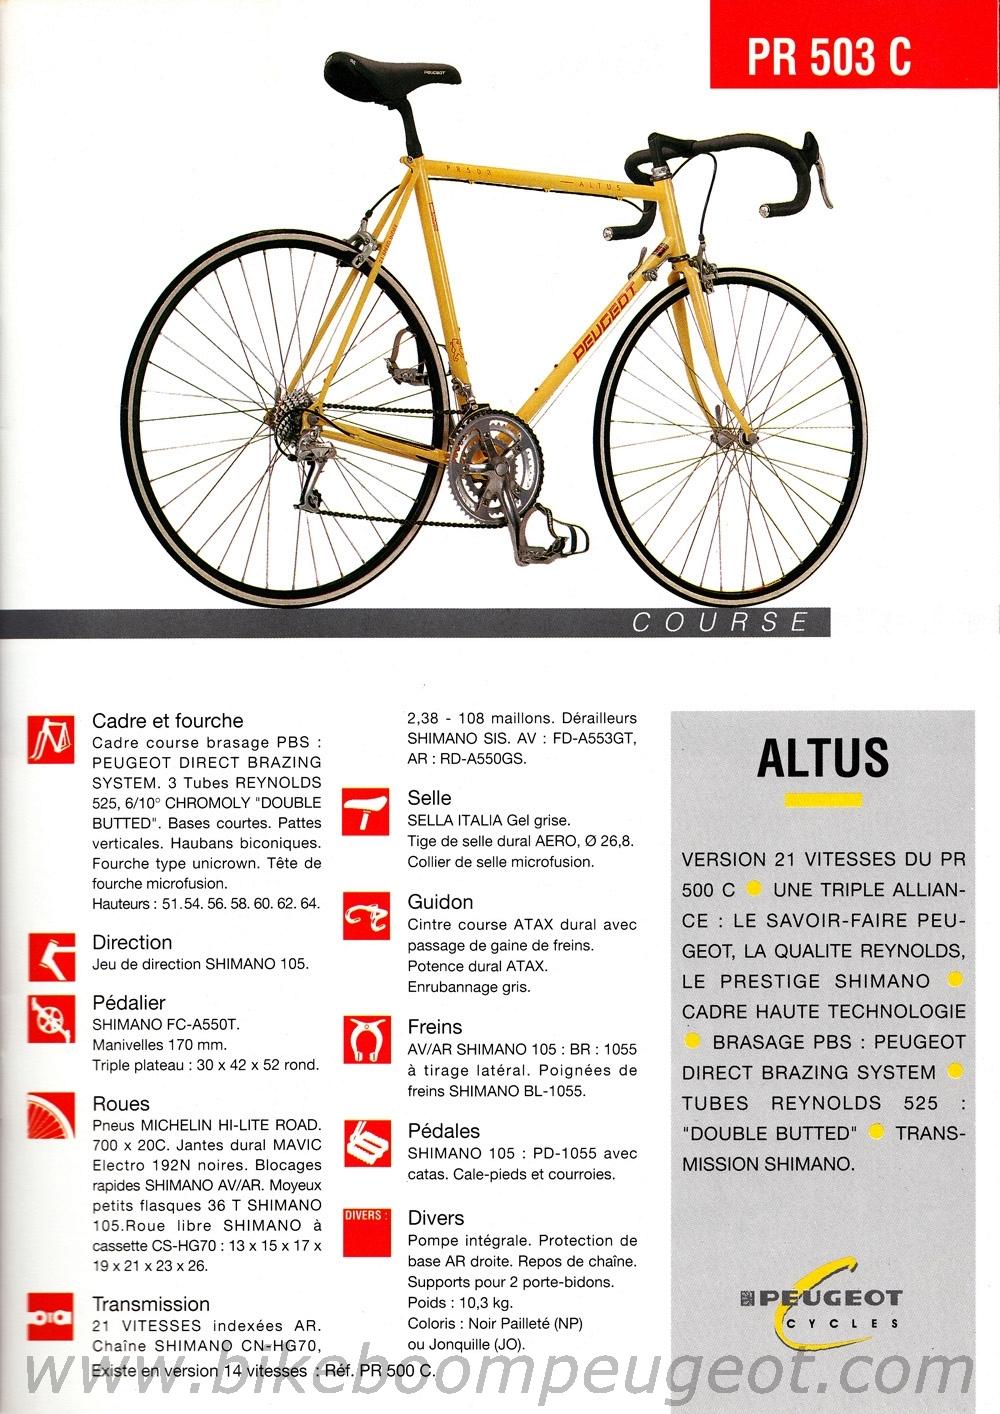 Peugeot Altus PR 503 1992 Cycles10